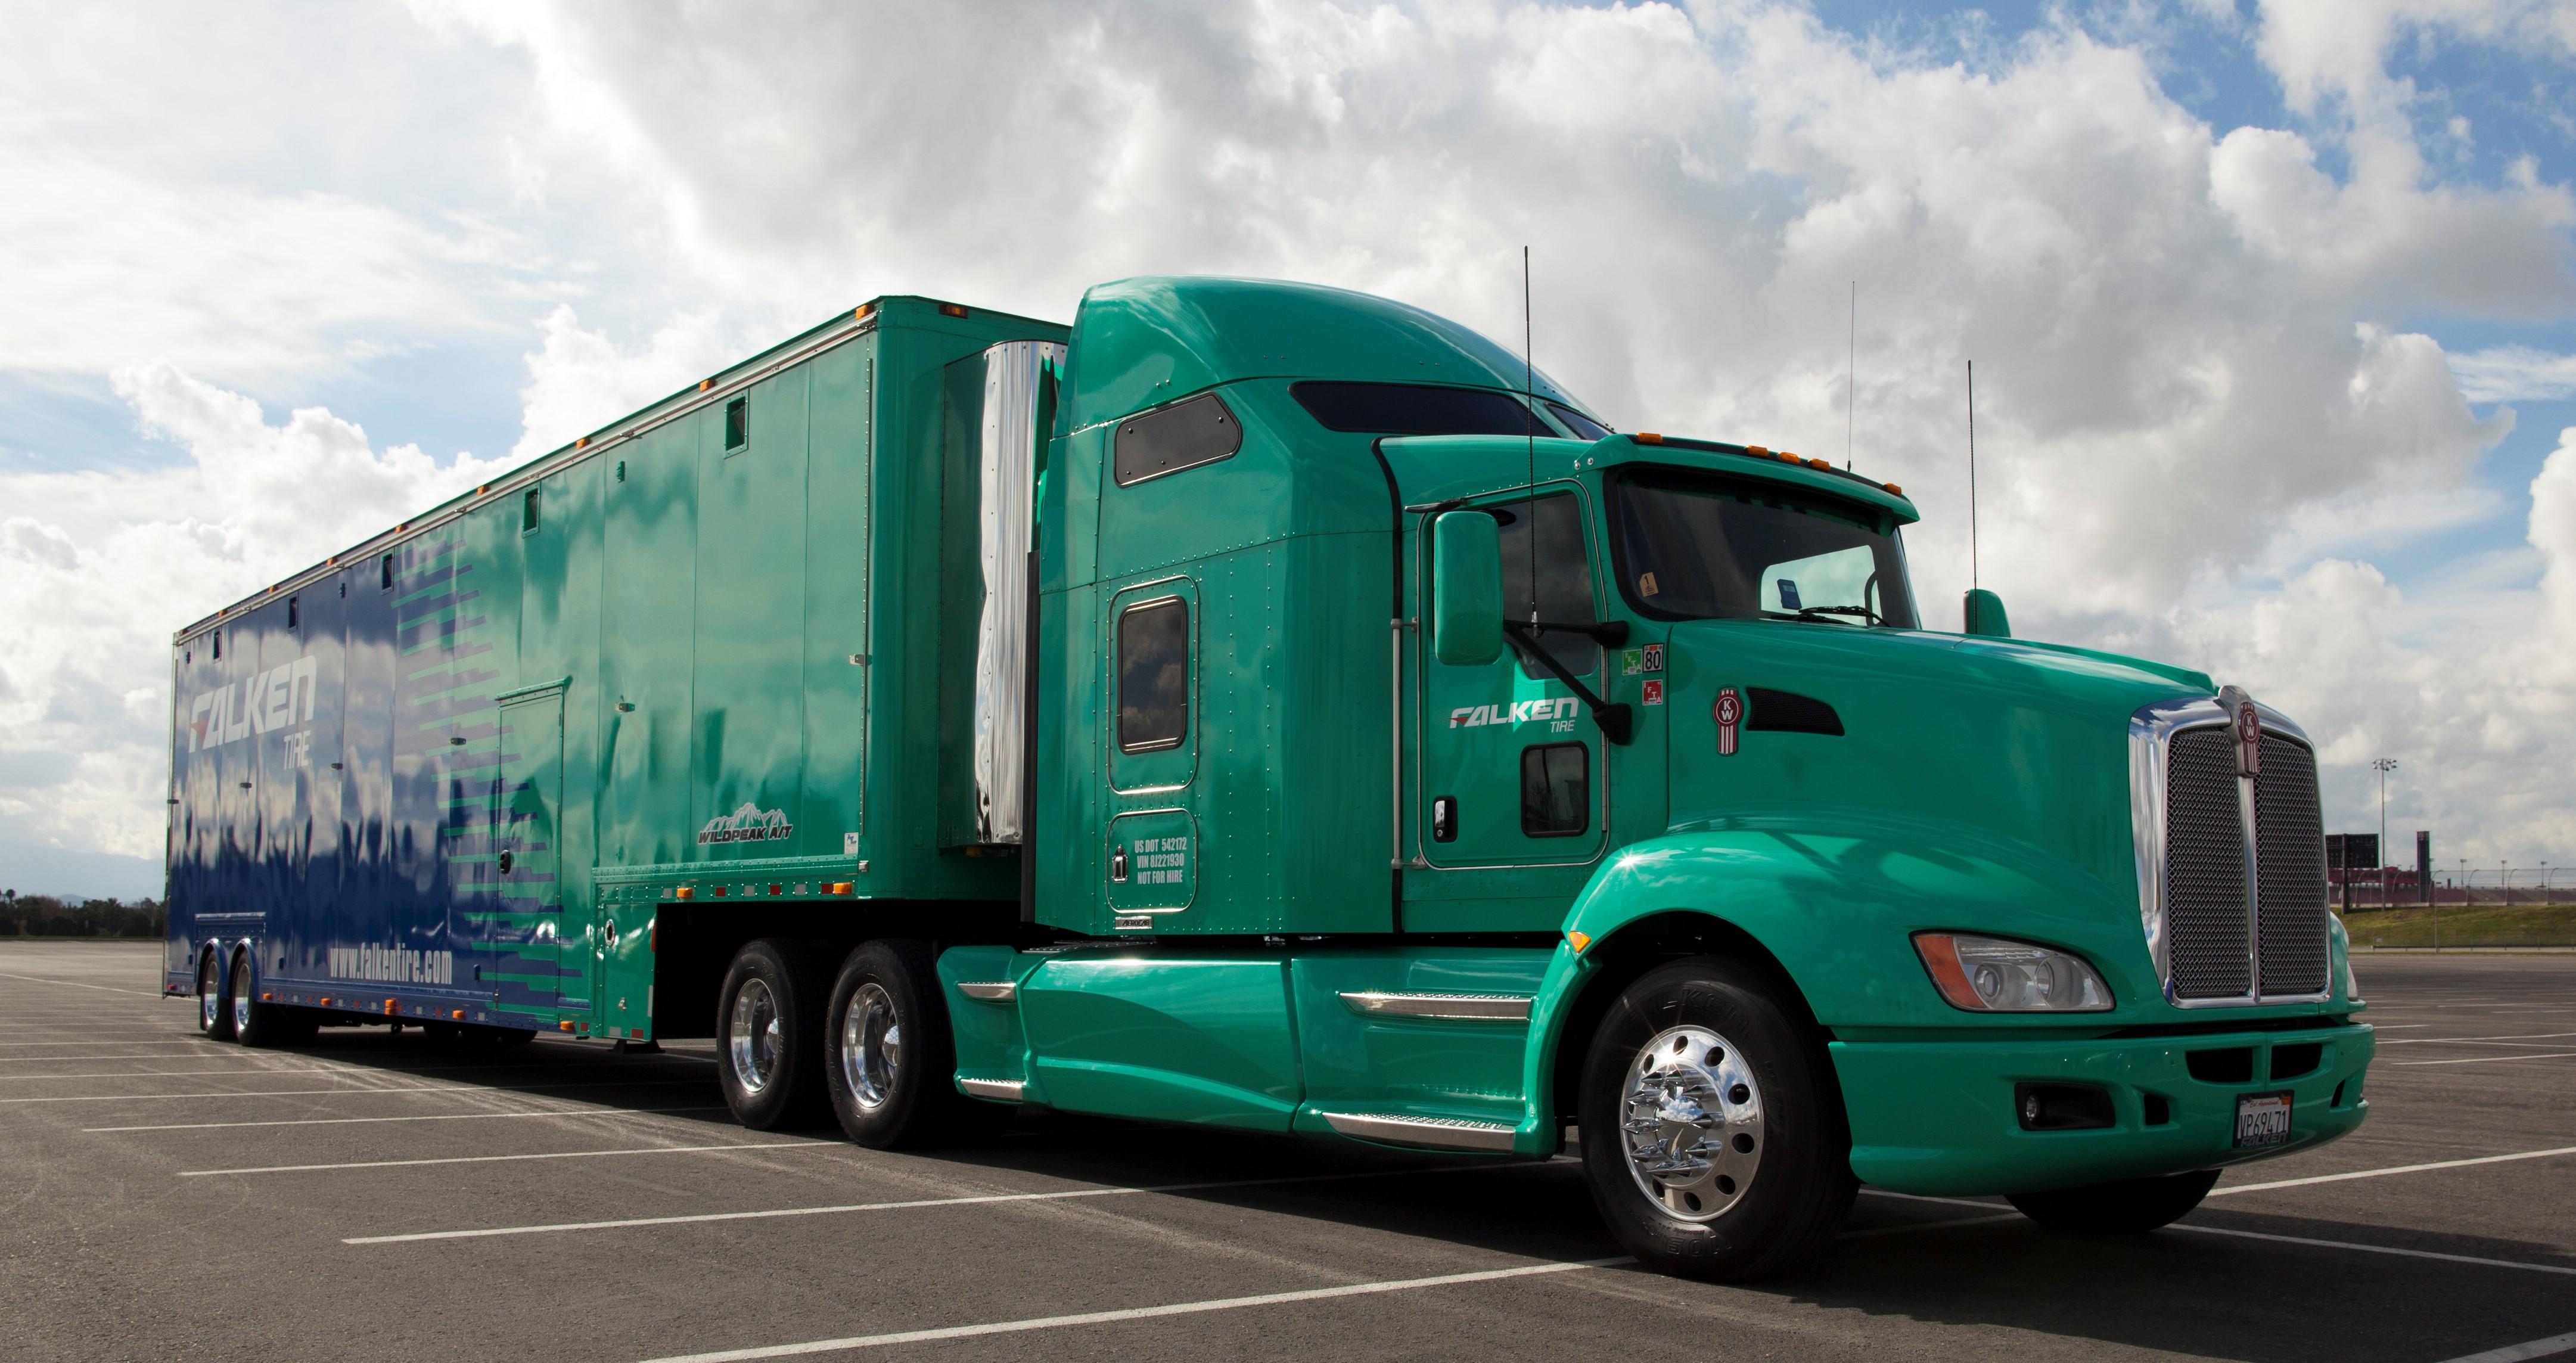 Sumitomo Targets May 11 for U.S. Plant Restart